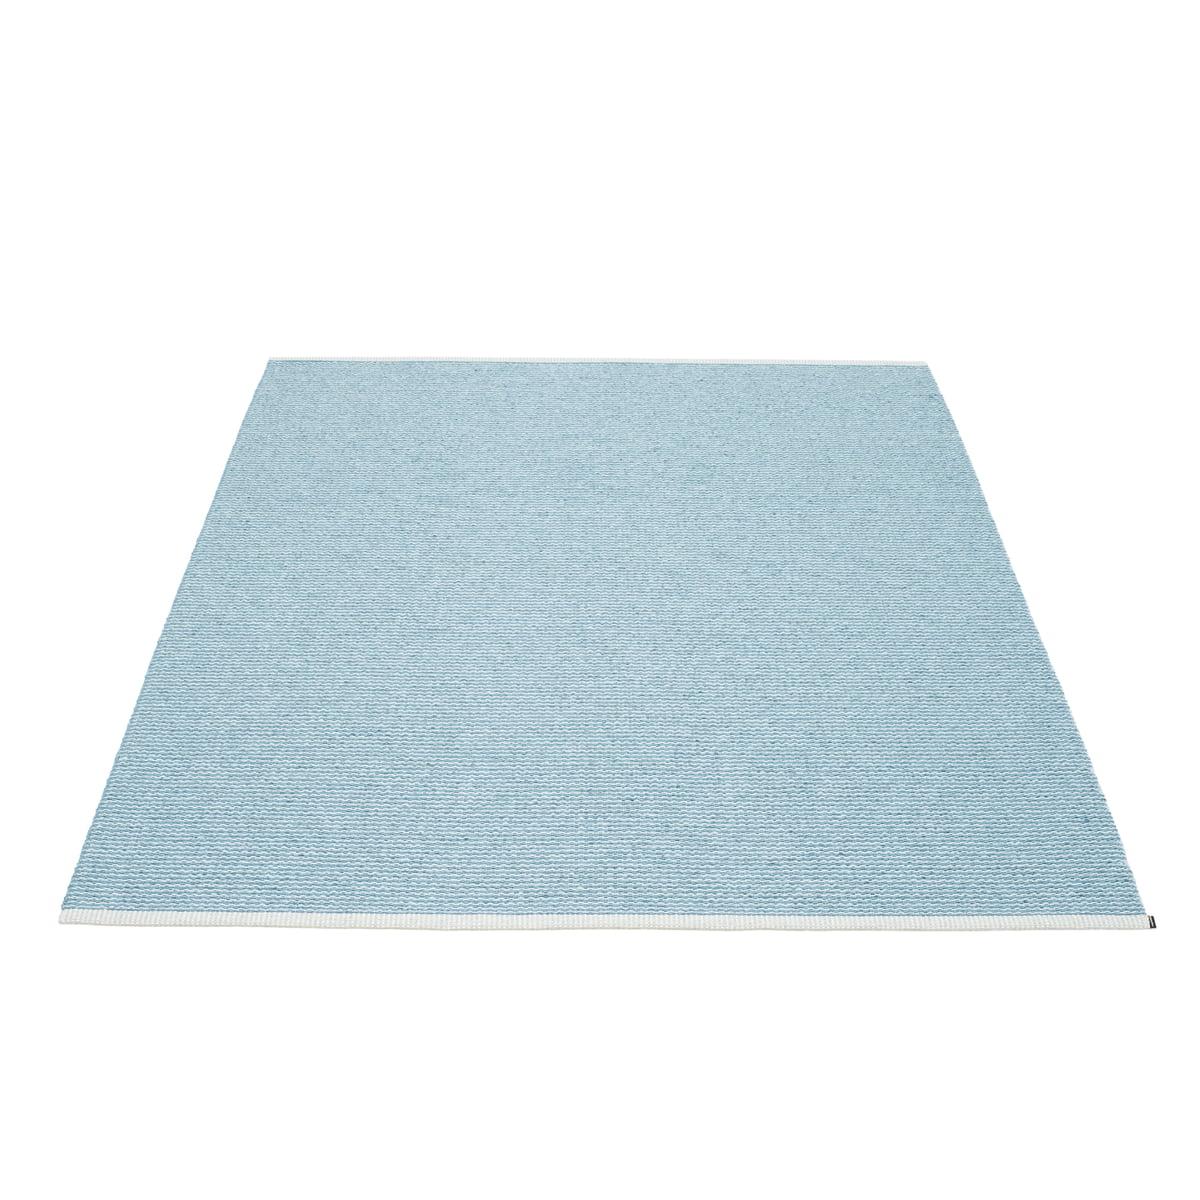 pappelina mono teppich 180 x 220 cm misty blue ice blue blau t 180 h 0 b 220 online kaufen. Black Bedroom Furniture Sets. Home Design Ideas